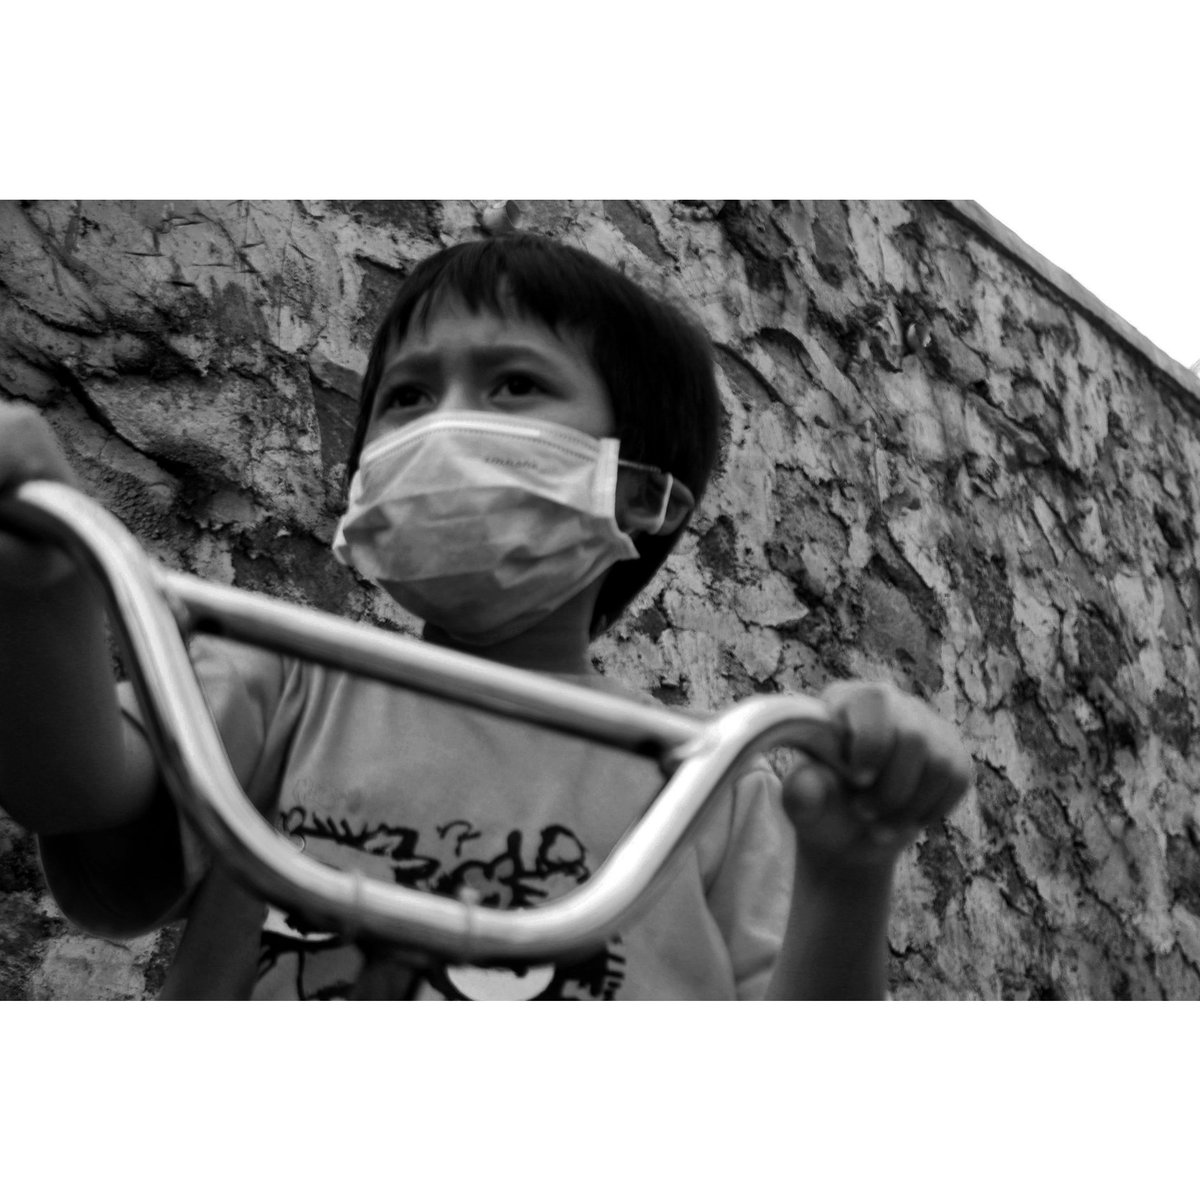 Pandemic era.  #streetphotography #streetphoto #savethechildren #bnwportrait #portrait #pandemic #COVID__19 #blackandwhitephotographypic.twitter.com/YClmm6ANsV